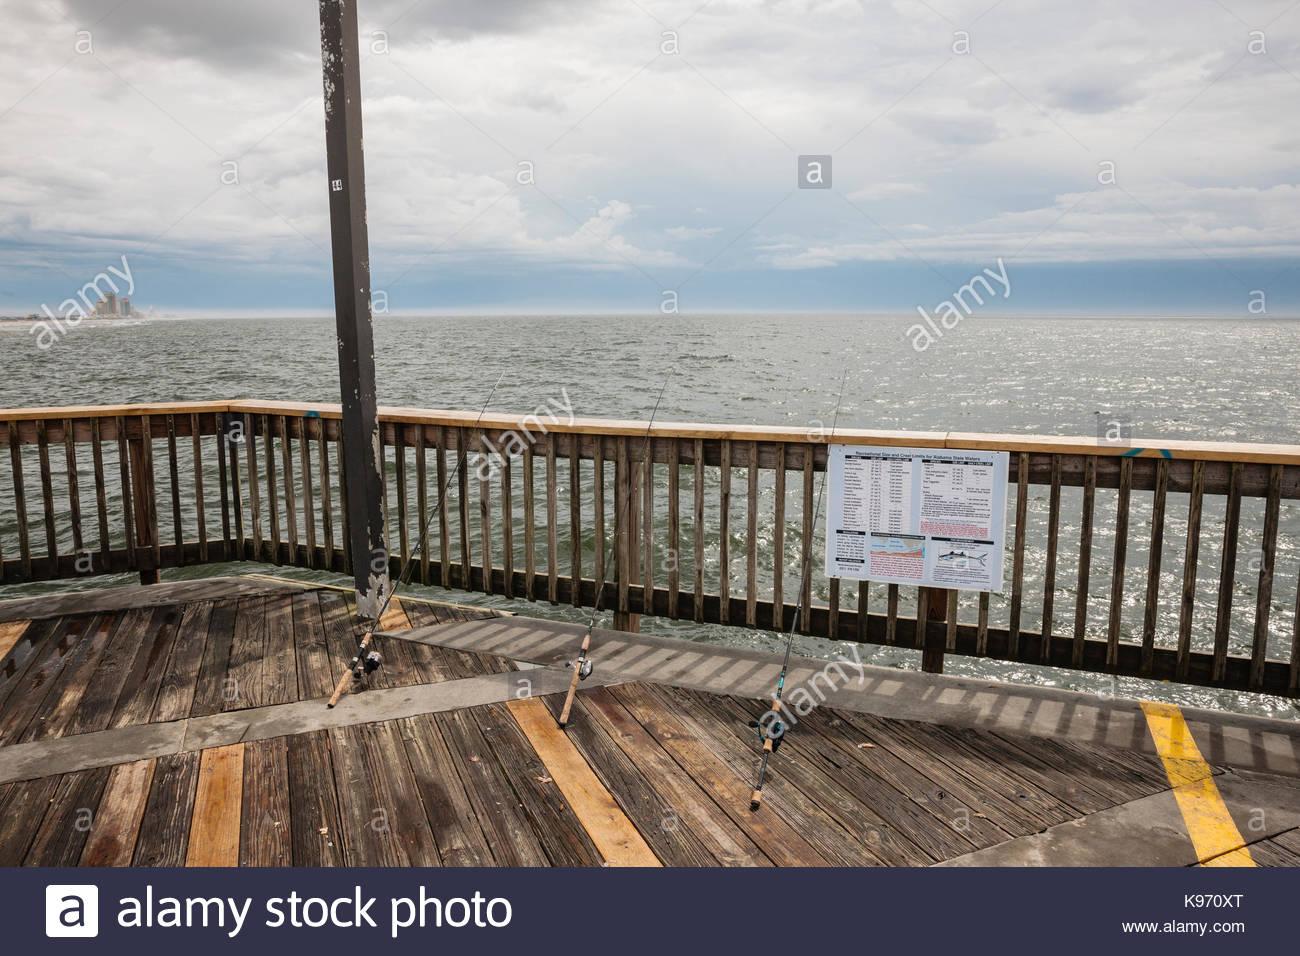 Alabama fishing stock photos alabama fishing stock for Gulf shores fishing pier